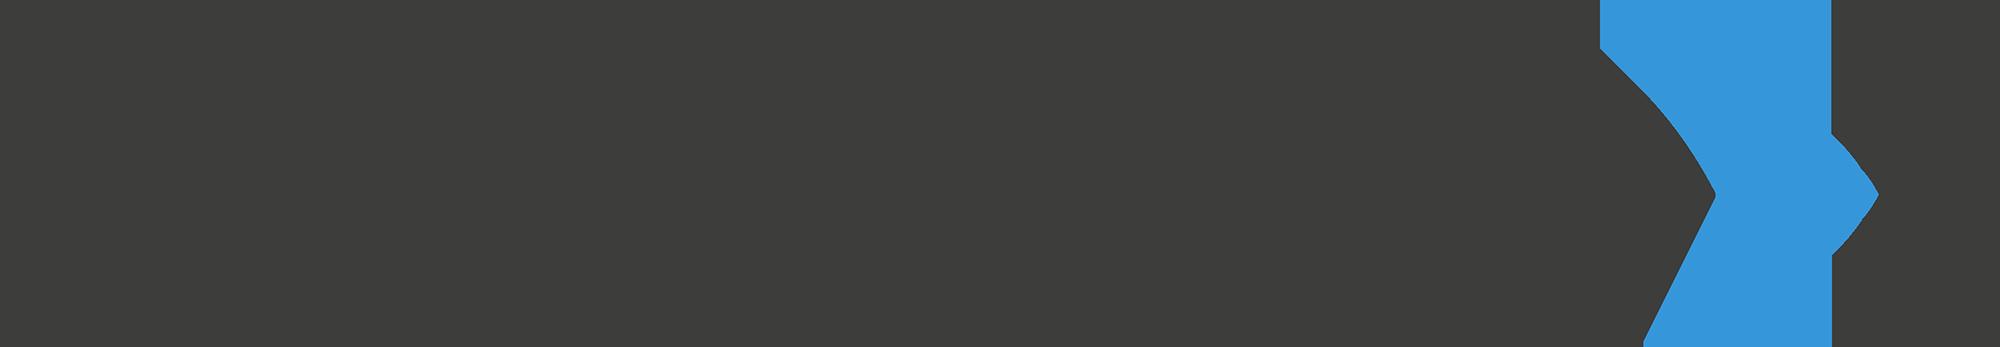 Acrolinx Logo 2000p